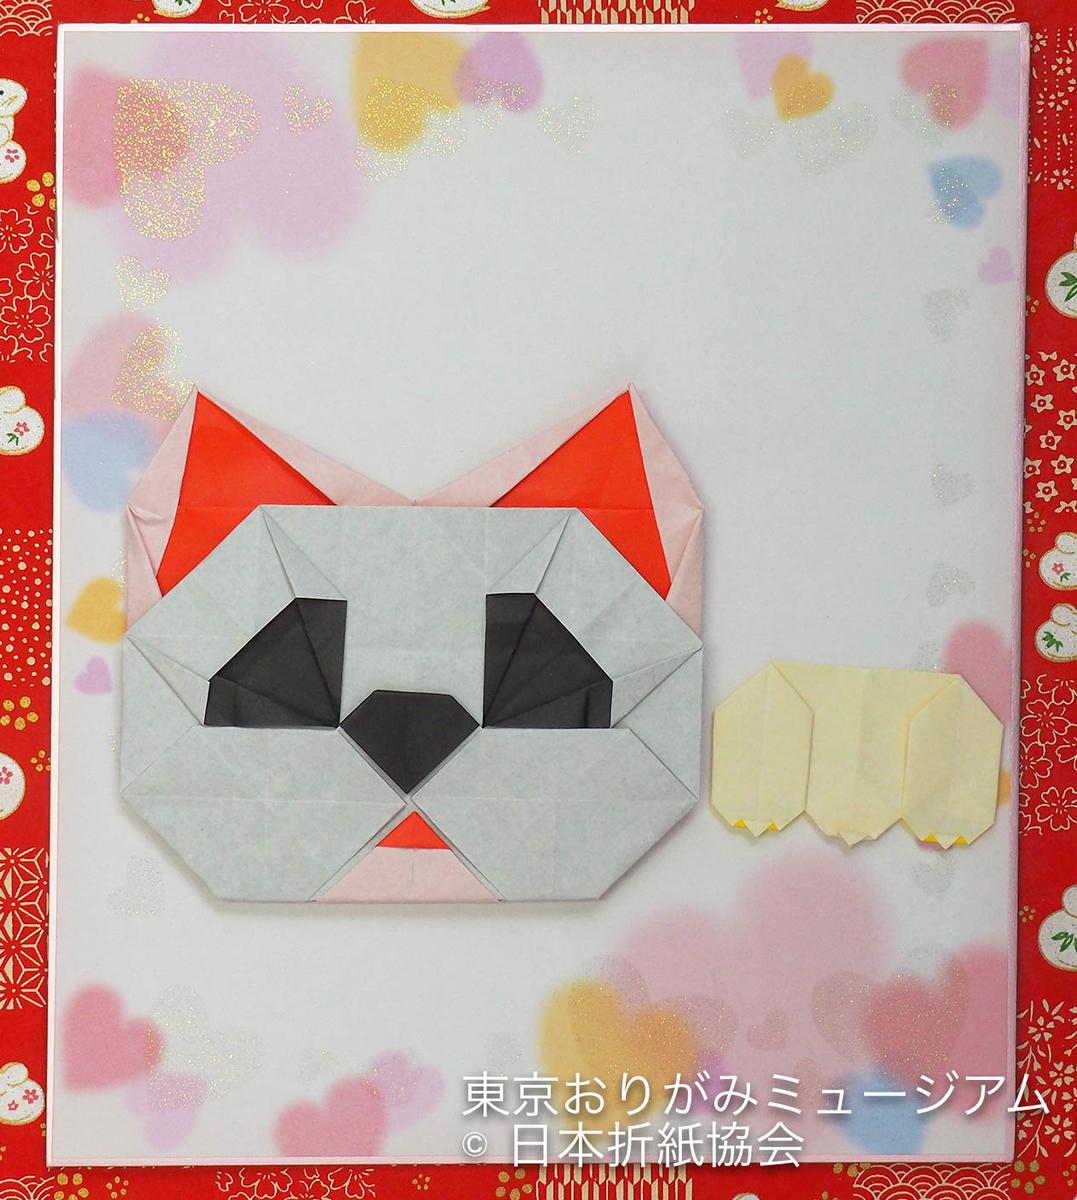 f:id:origami-noa:20200107182425j:plain